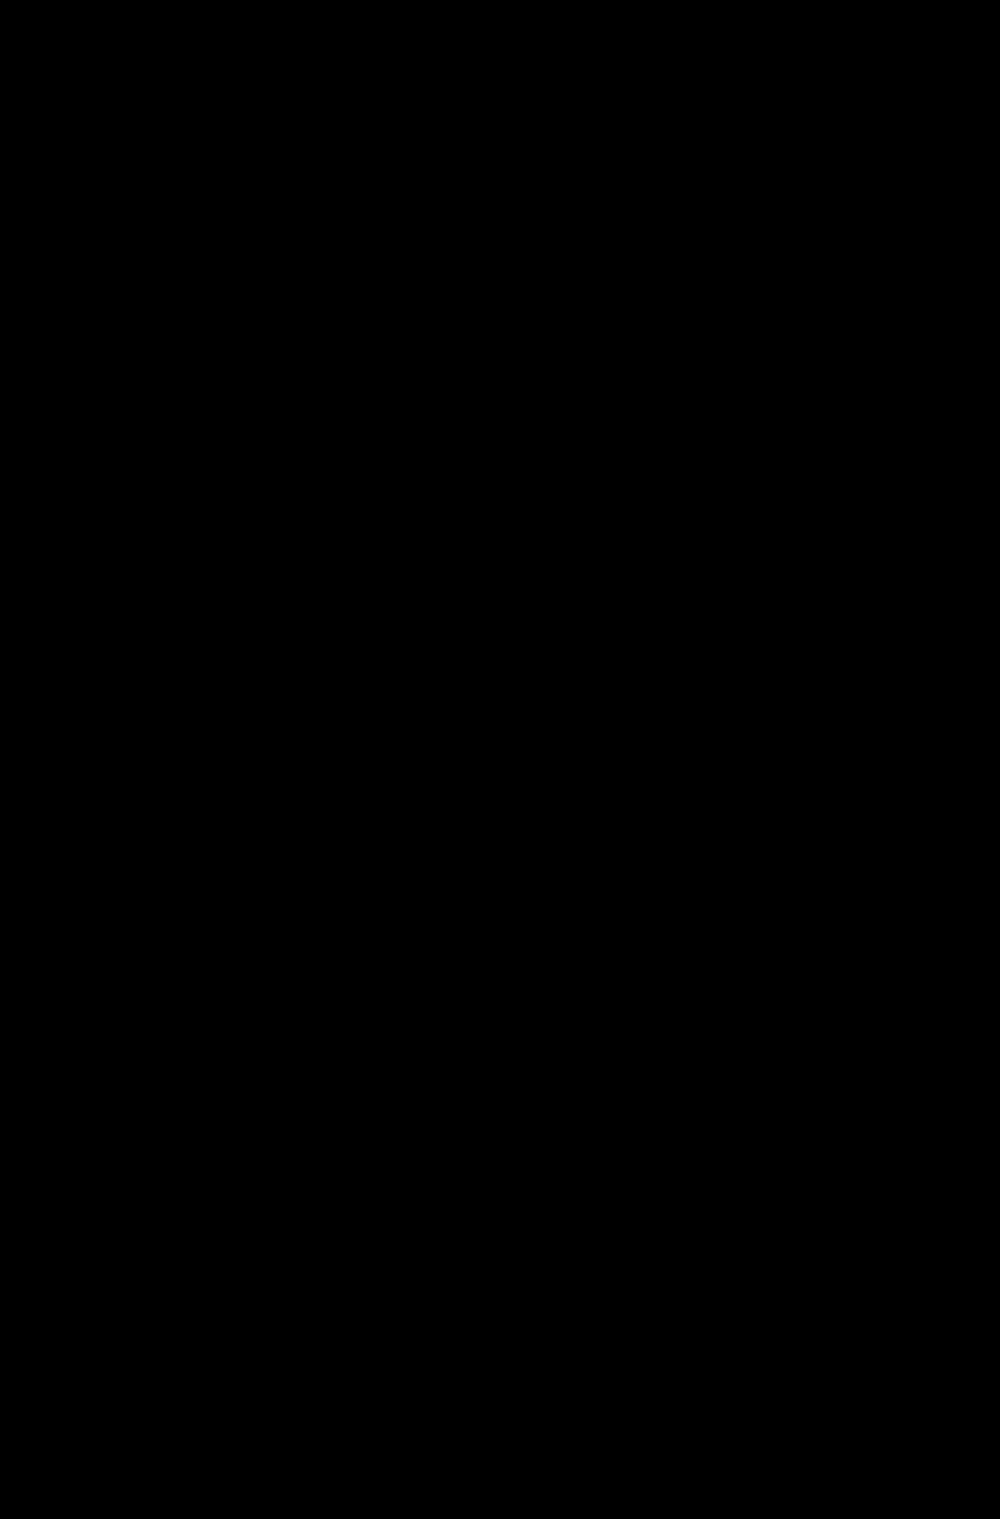 bdc-contrast